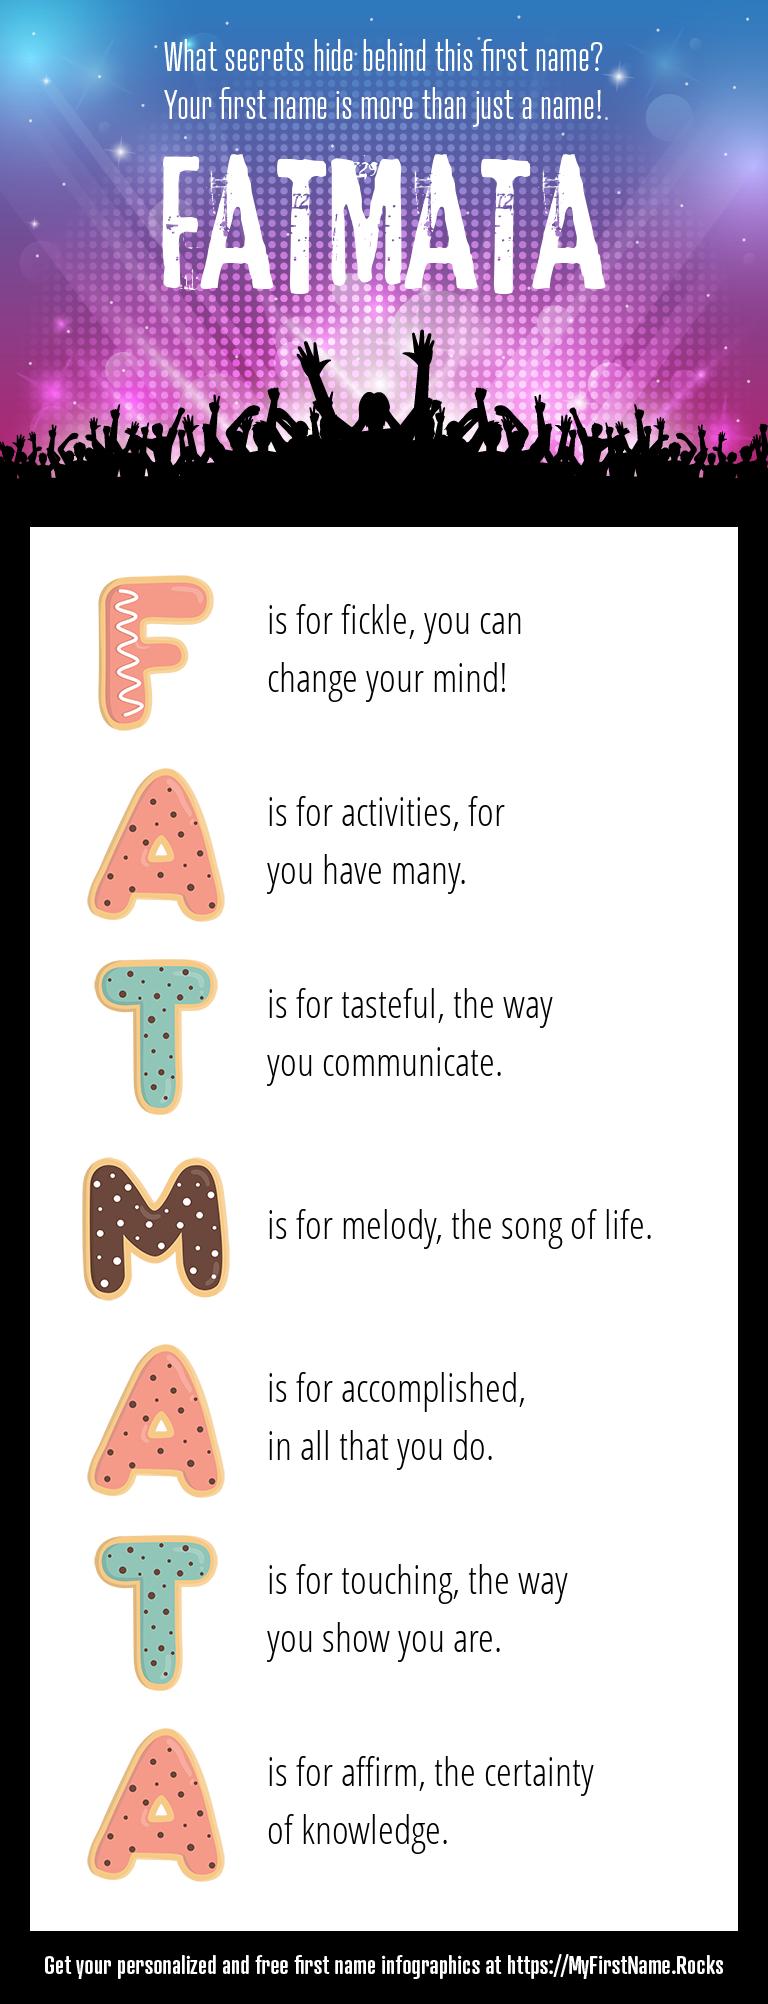 Fatmata Infographics